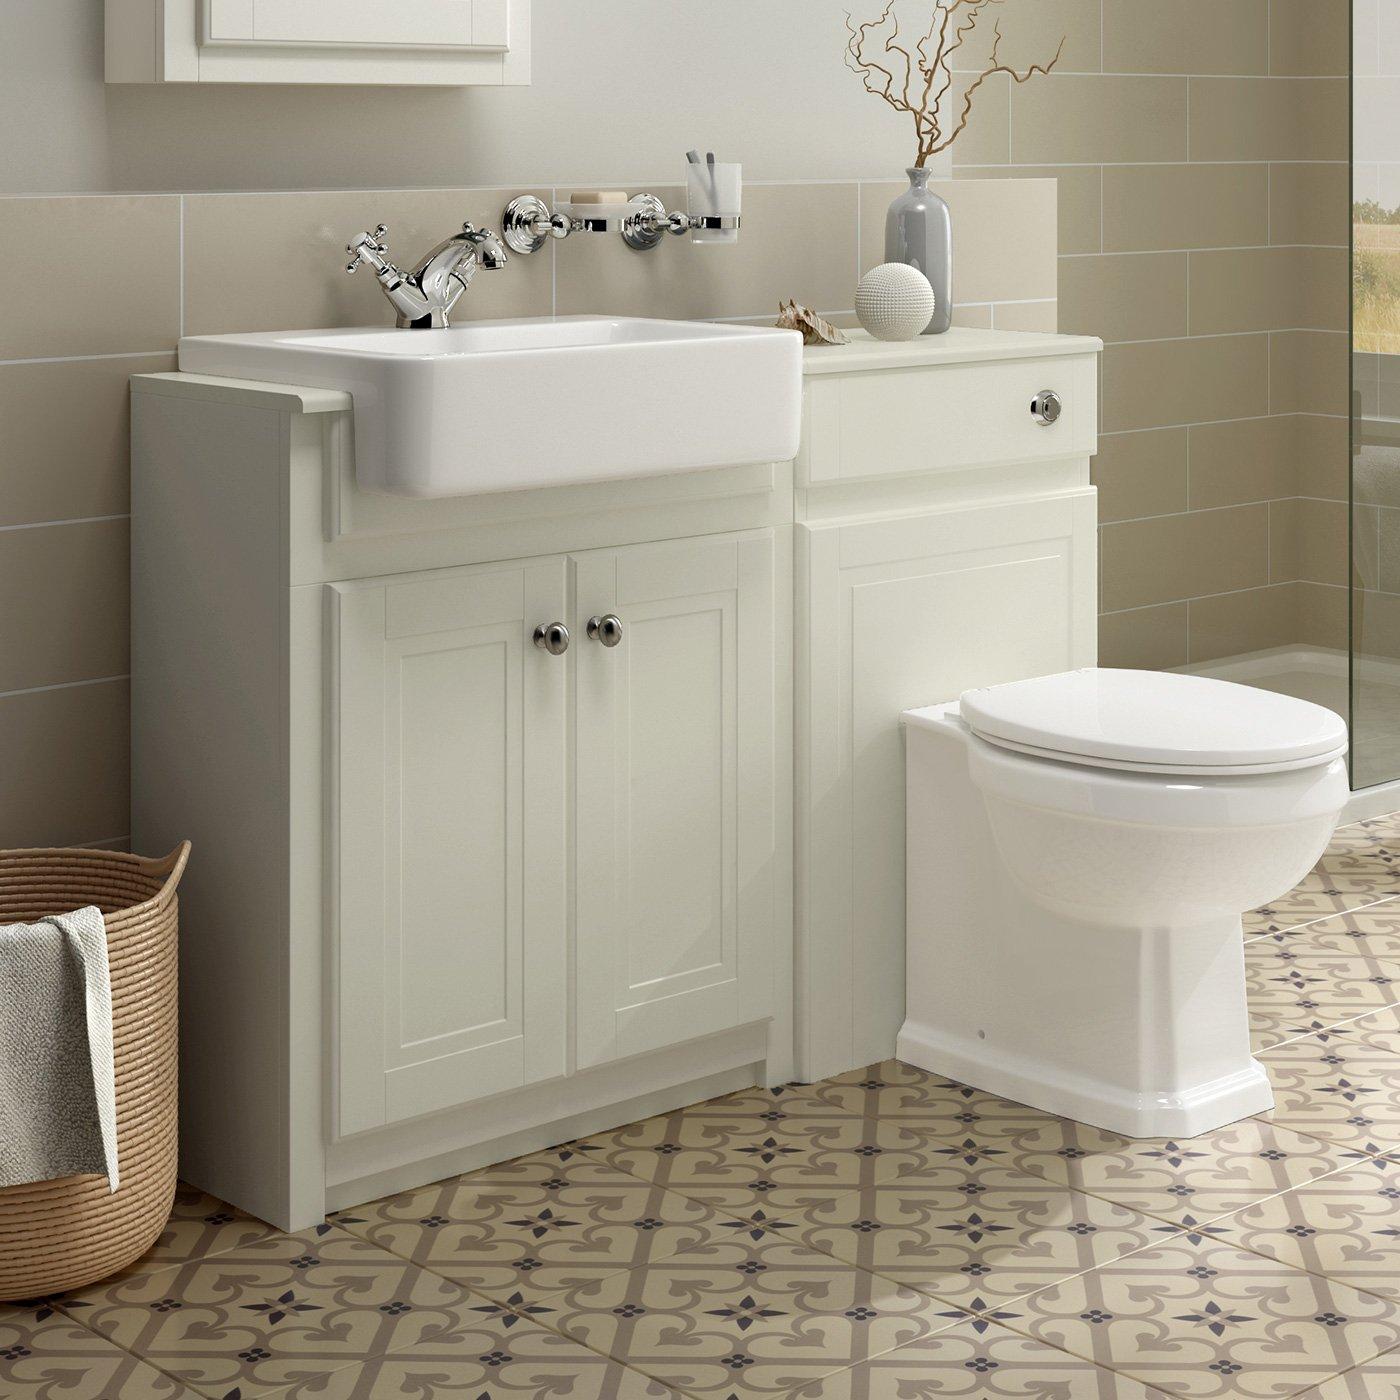 1167mm Combined Vanity Unit Toilet Basin Bathroom Furniture Storage